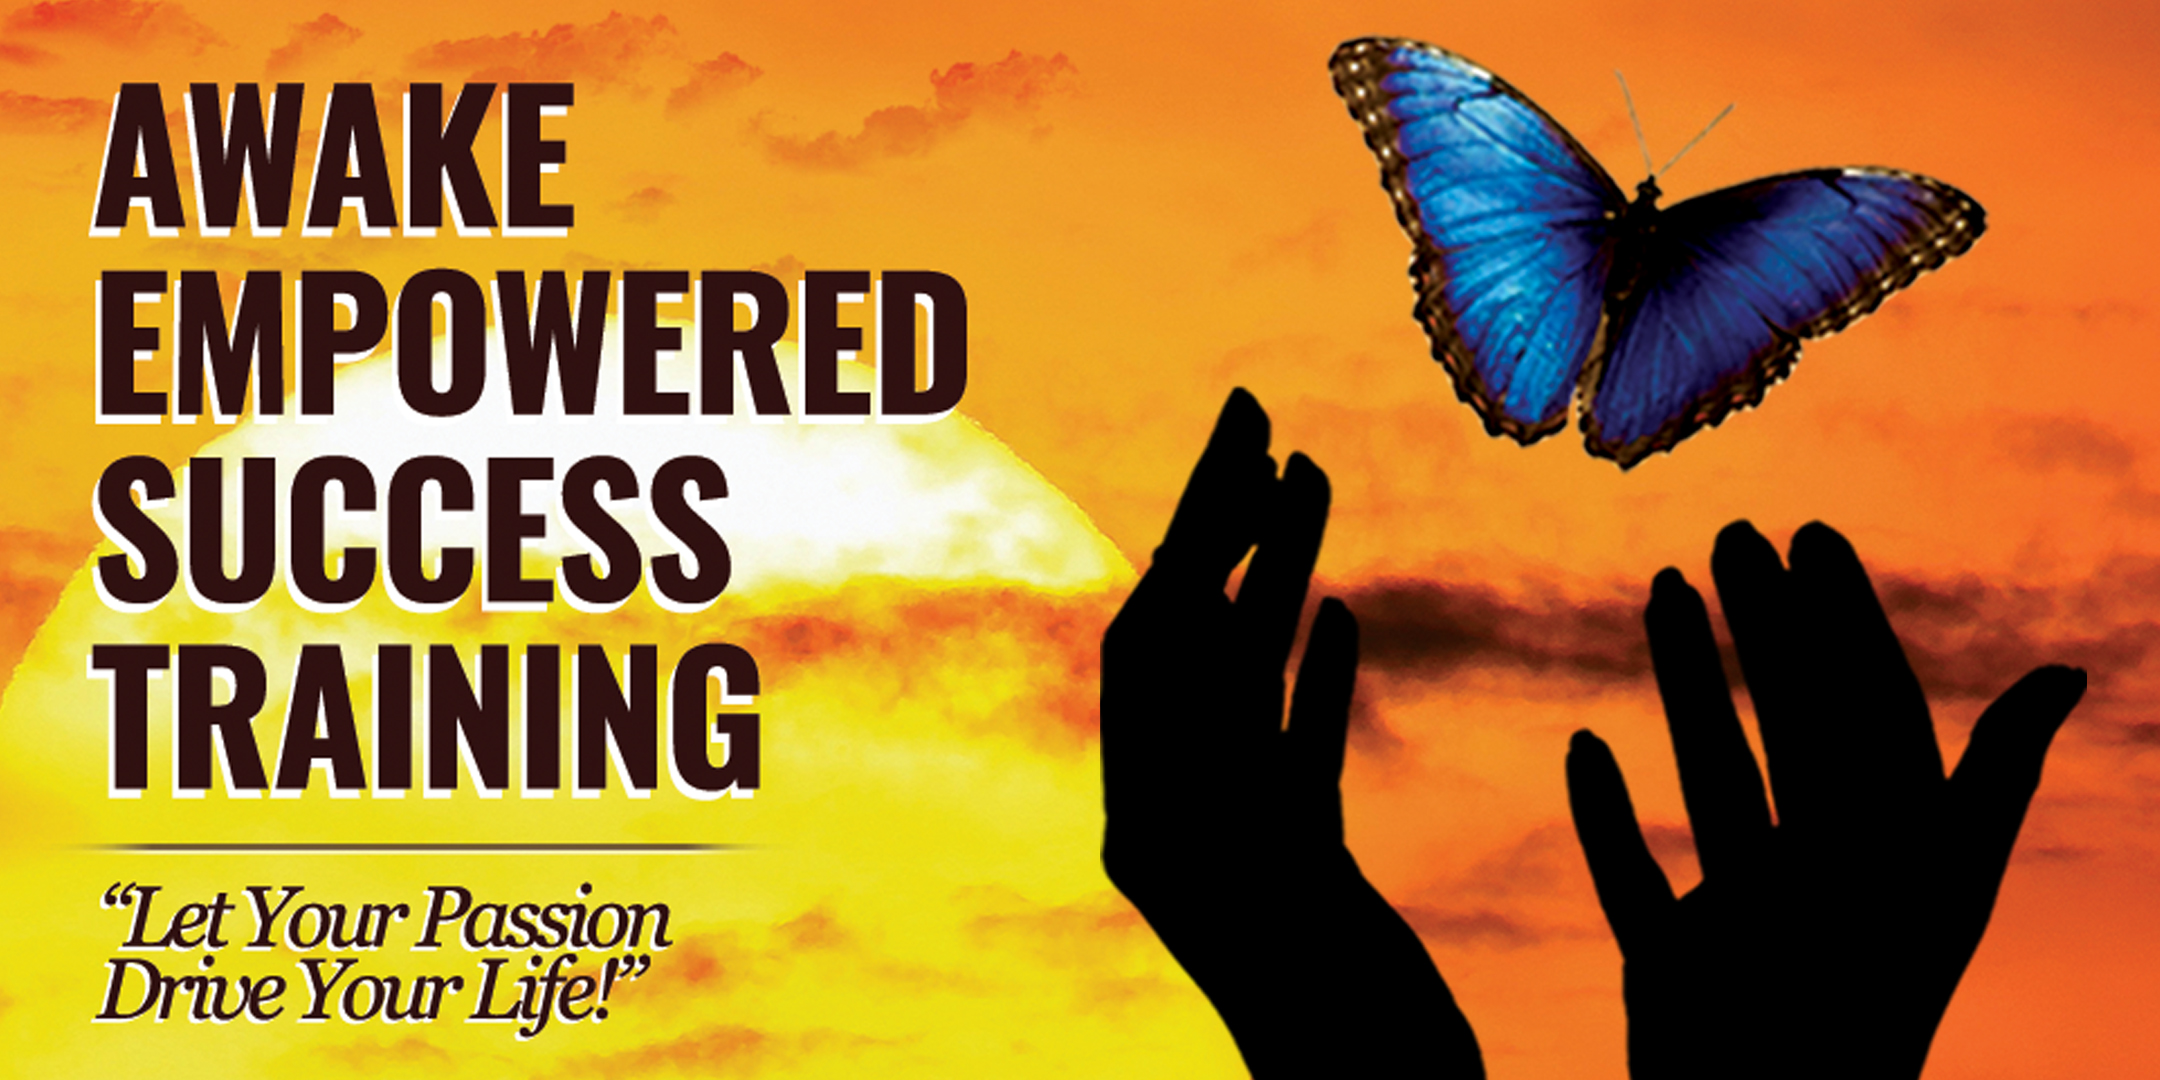 Awake Empowered Success: 3-Day Intensive Training (3/2017)